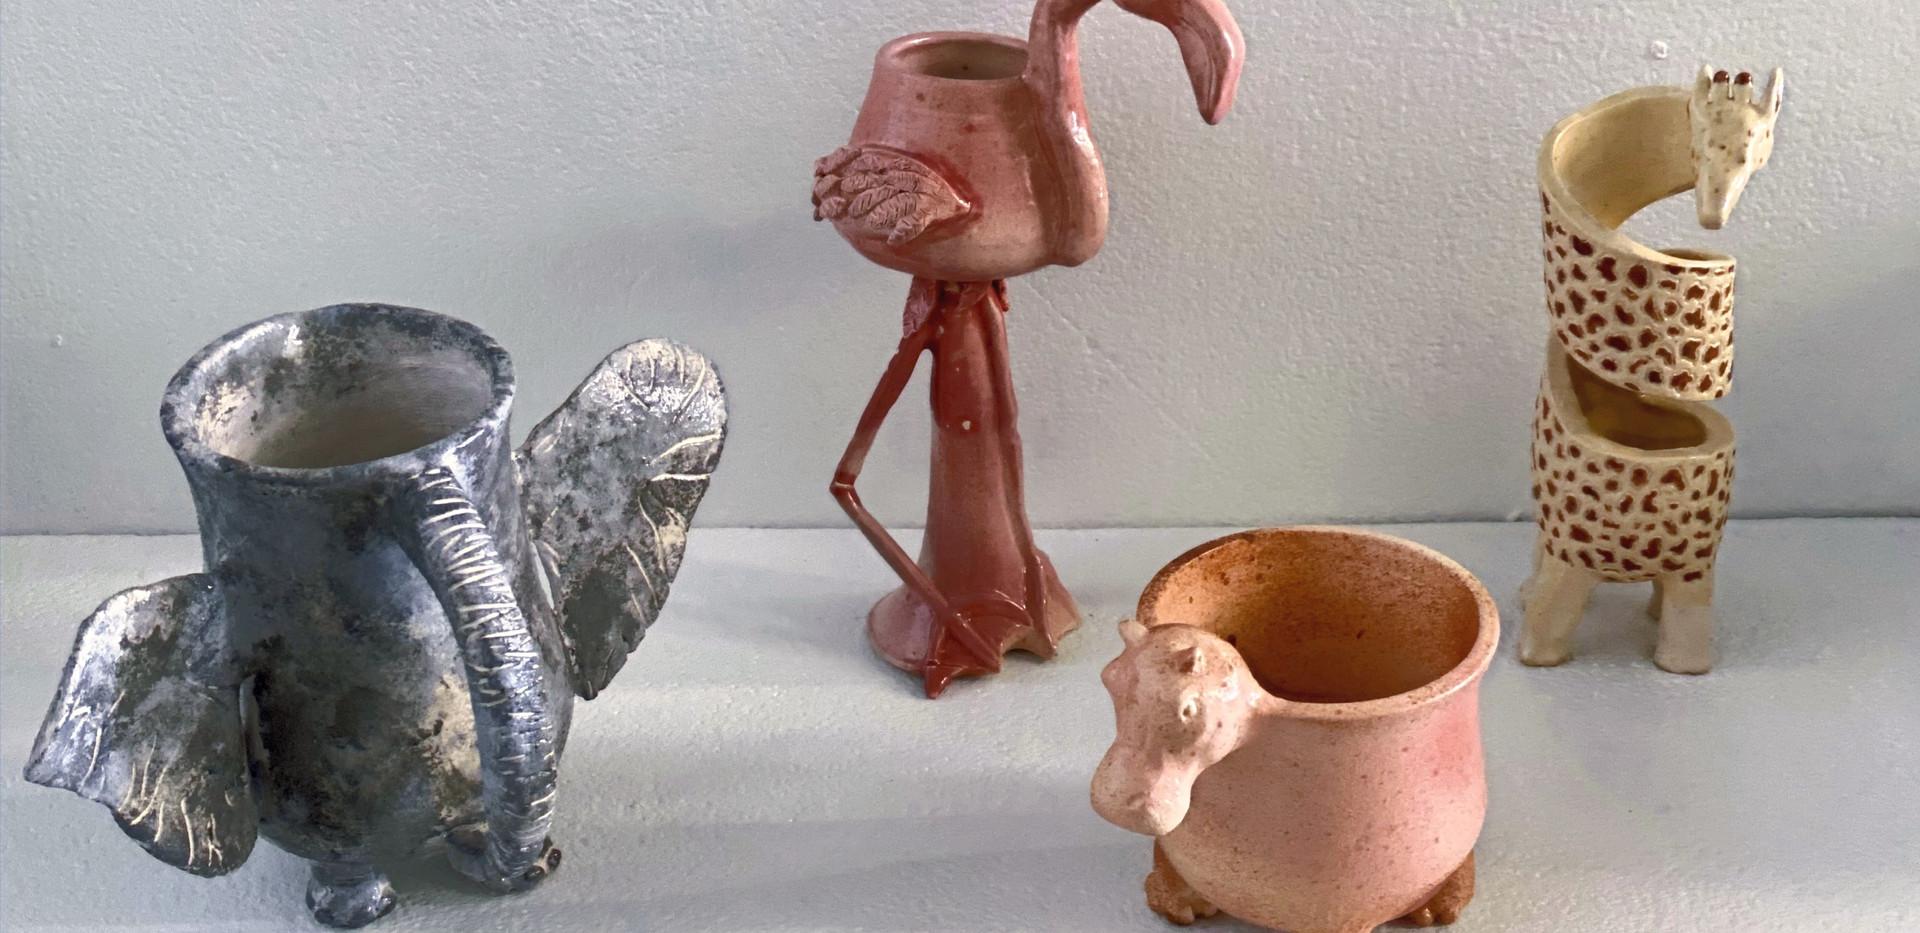 The Ceramic Zoo